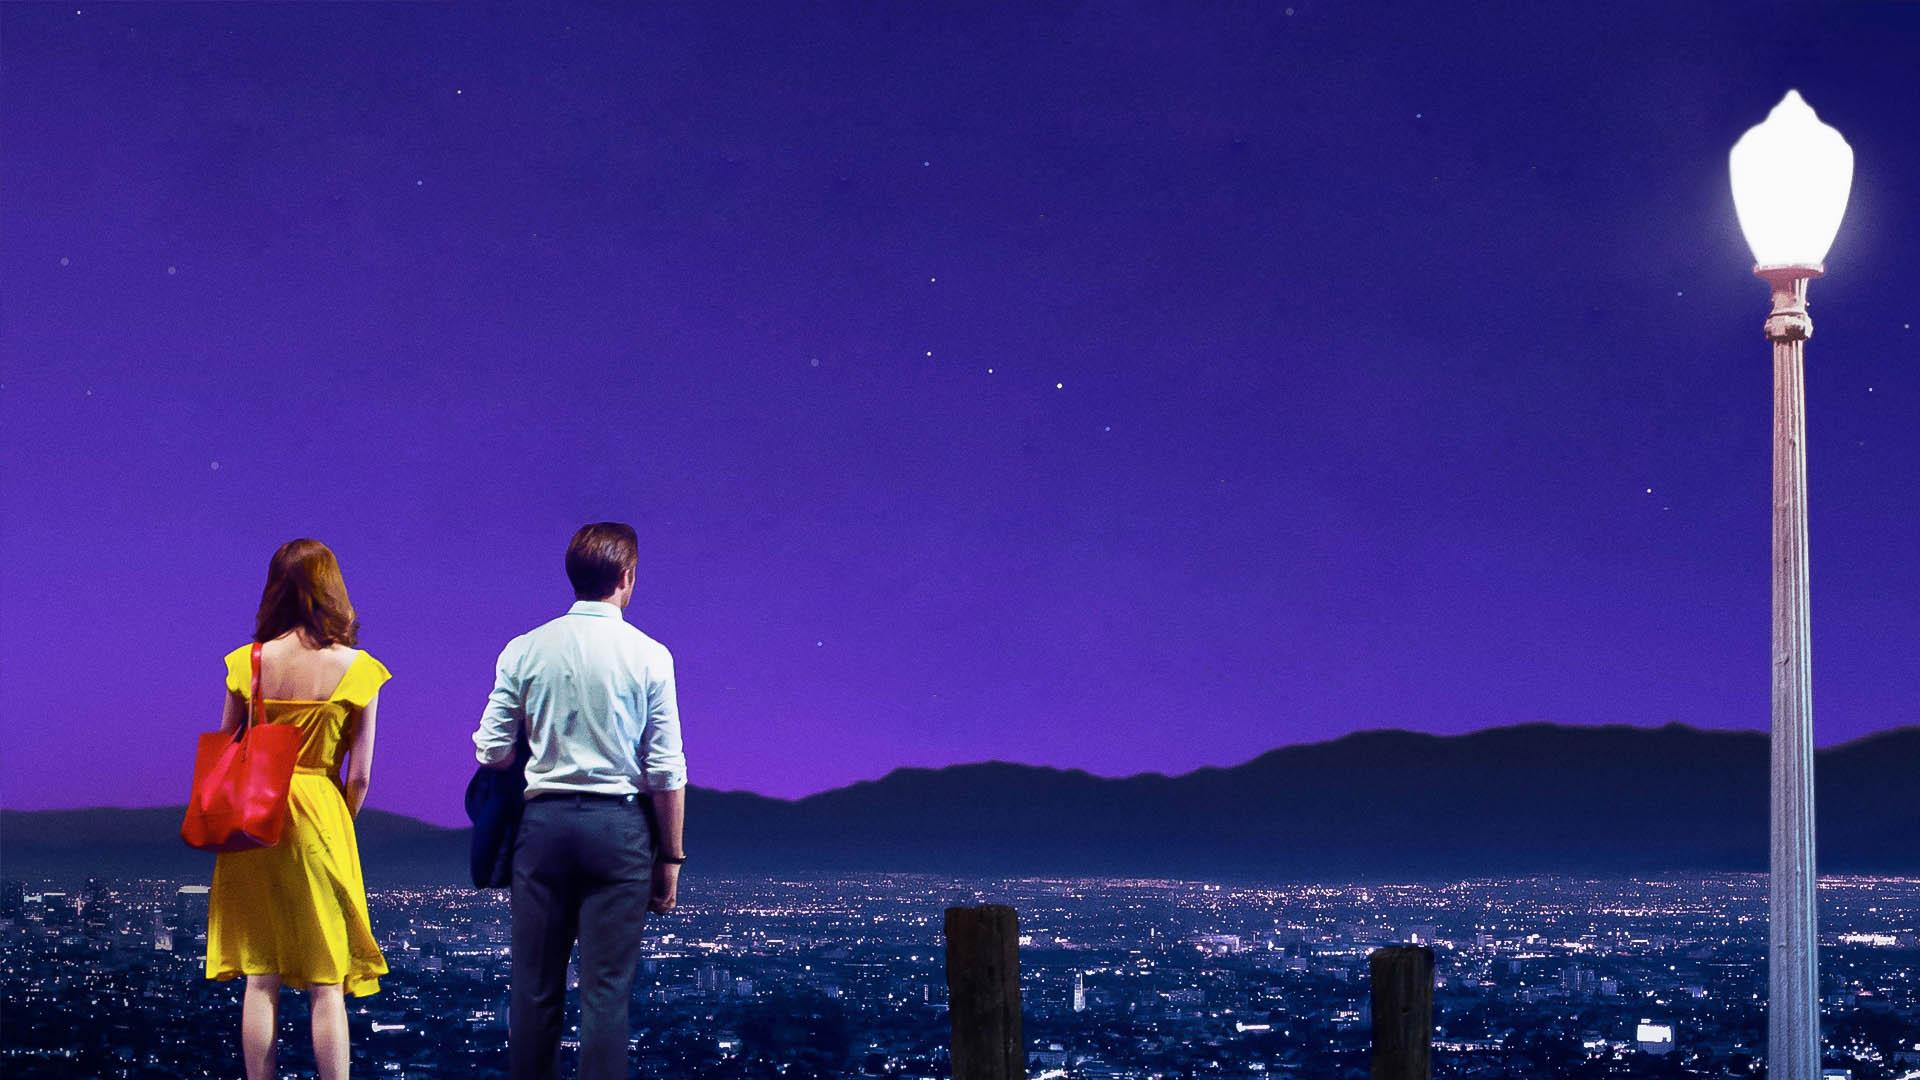 Objavljene nominacije za Zlatni globus: La La Land glavni favorit s čak sedam nominacija